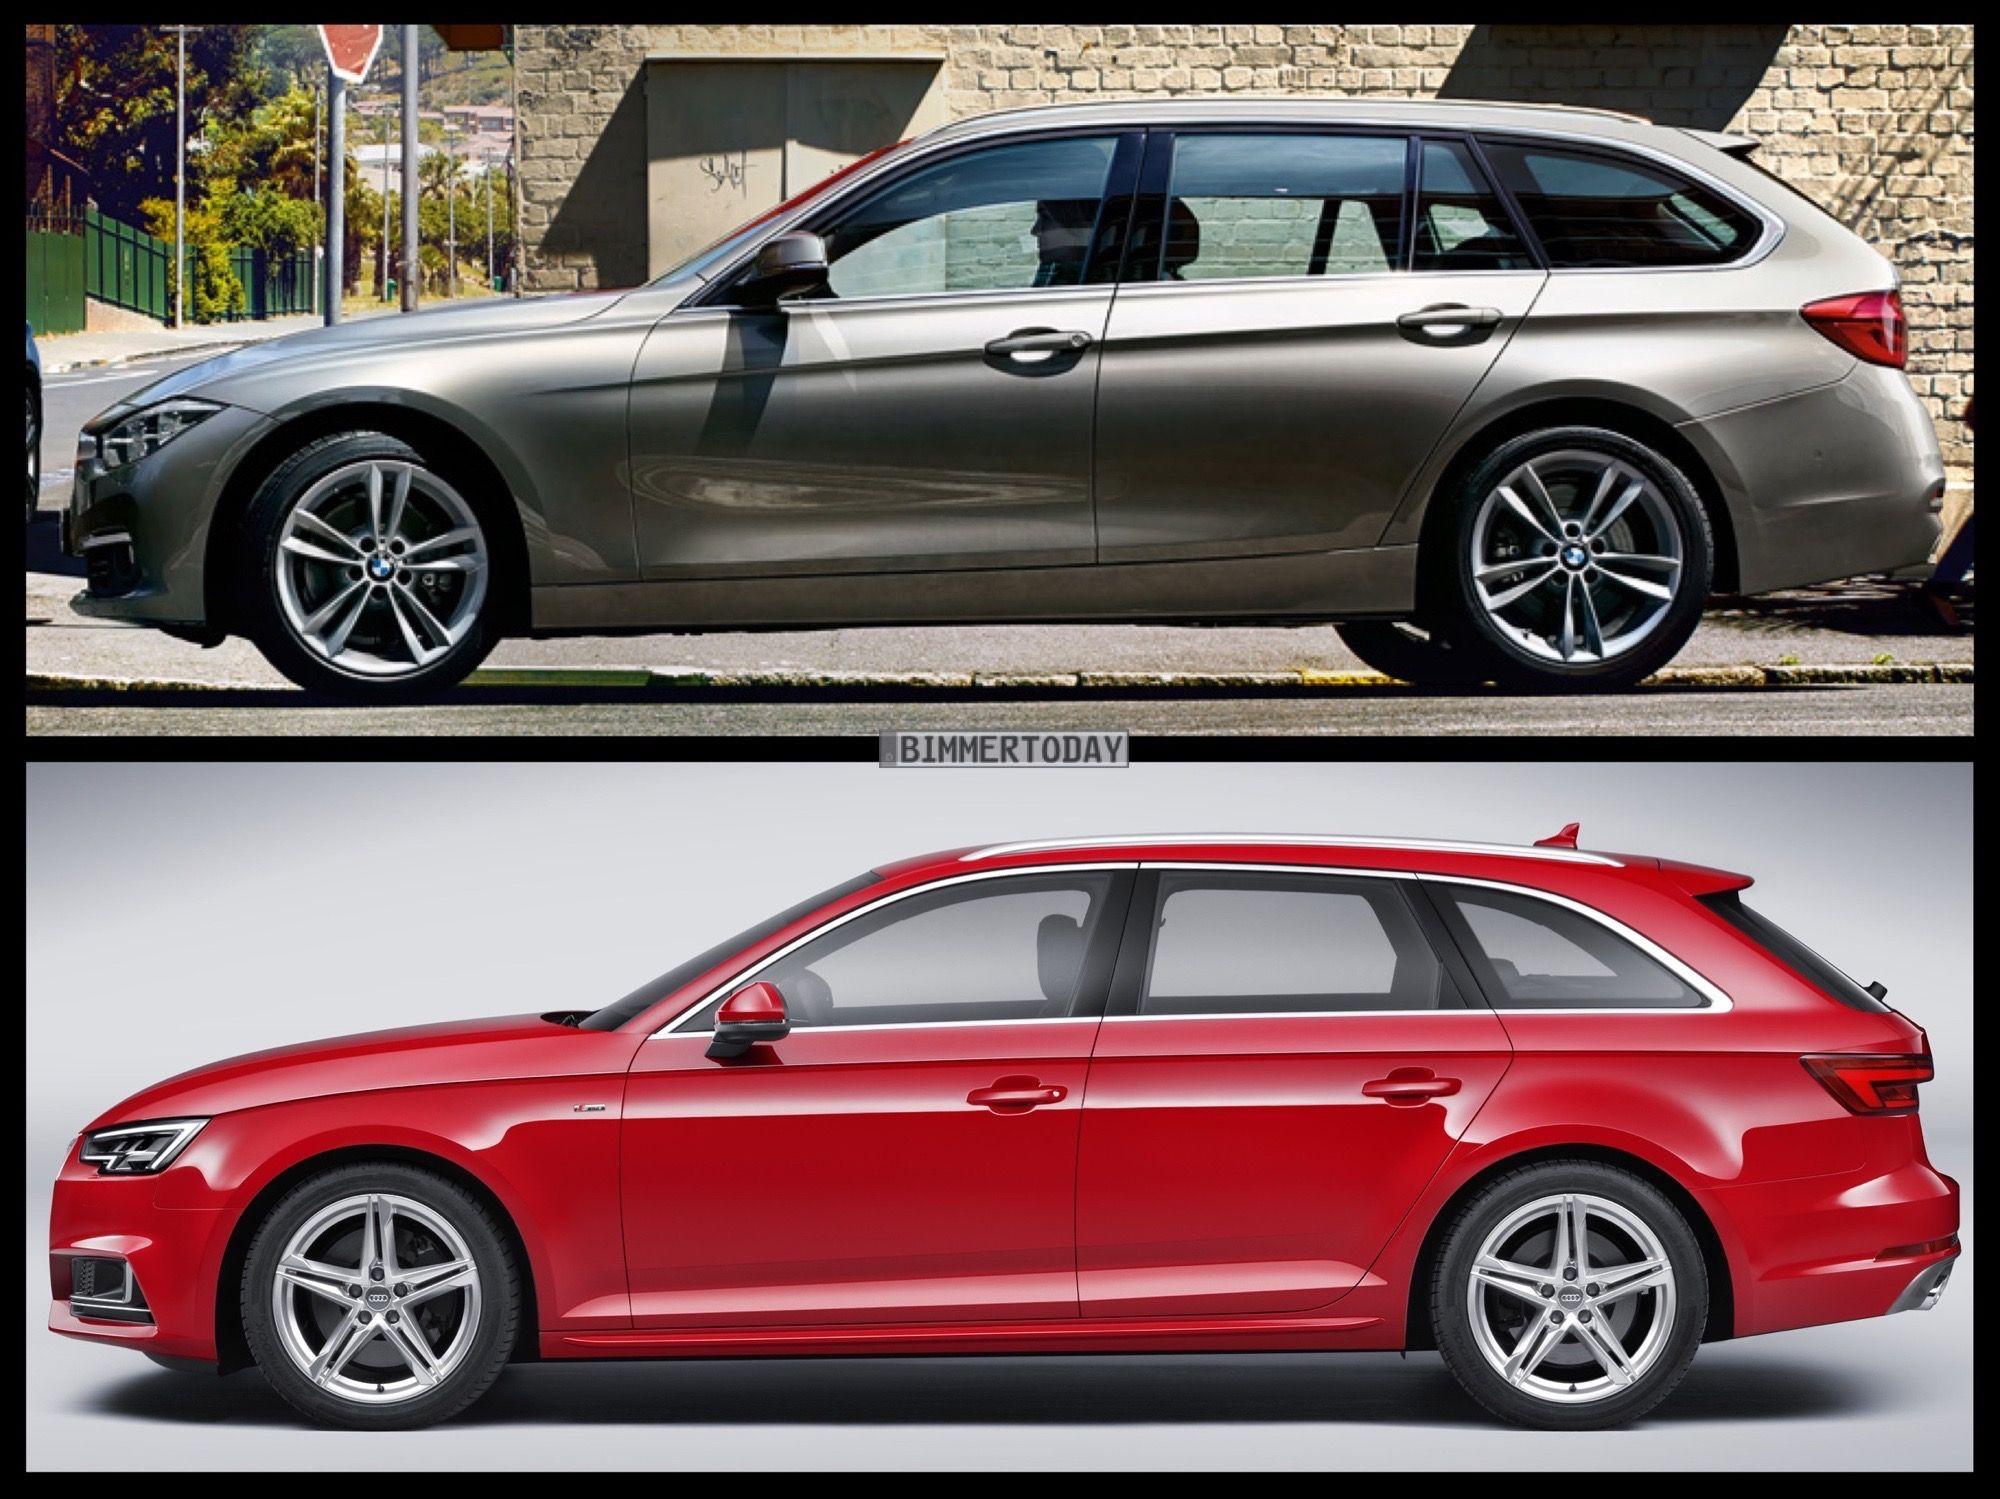 BMW 3 Series Touring vs Audi A4 Avant vs Mercedes-Benz C-Class Estate - http://www.bmwblog.com/2017/05/02/bmw-3-series-touring-vs-audi-a4-avant-vs-mercedes-benz-c-class-estate/